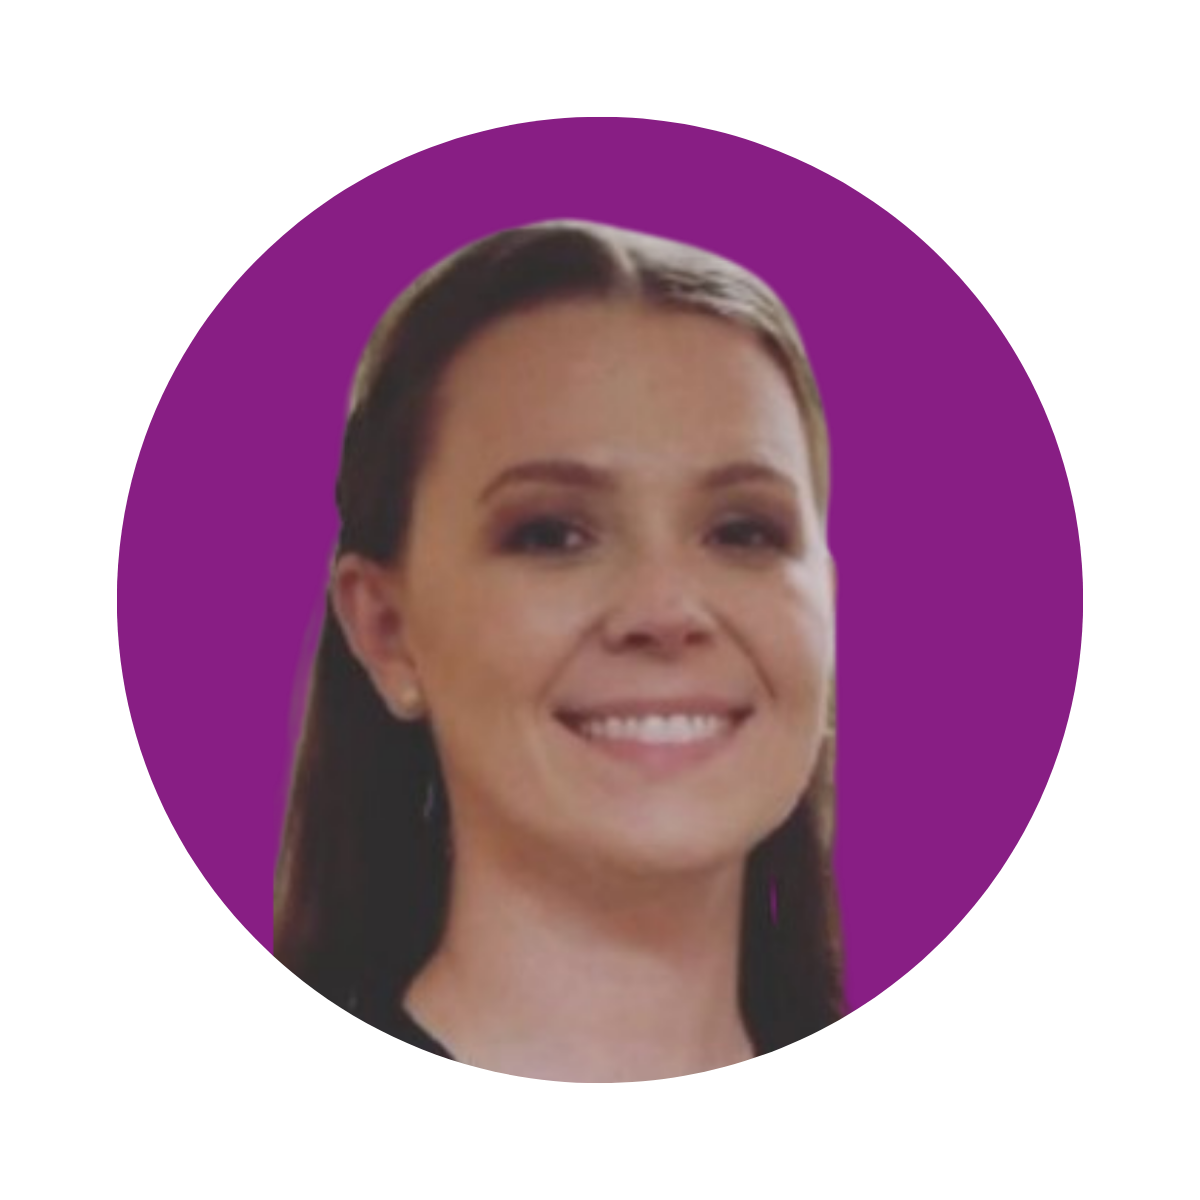 Jenna Cannon